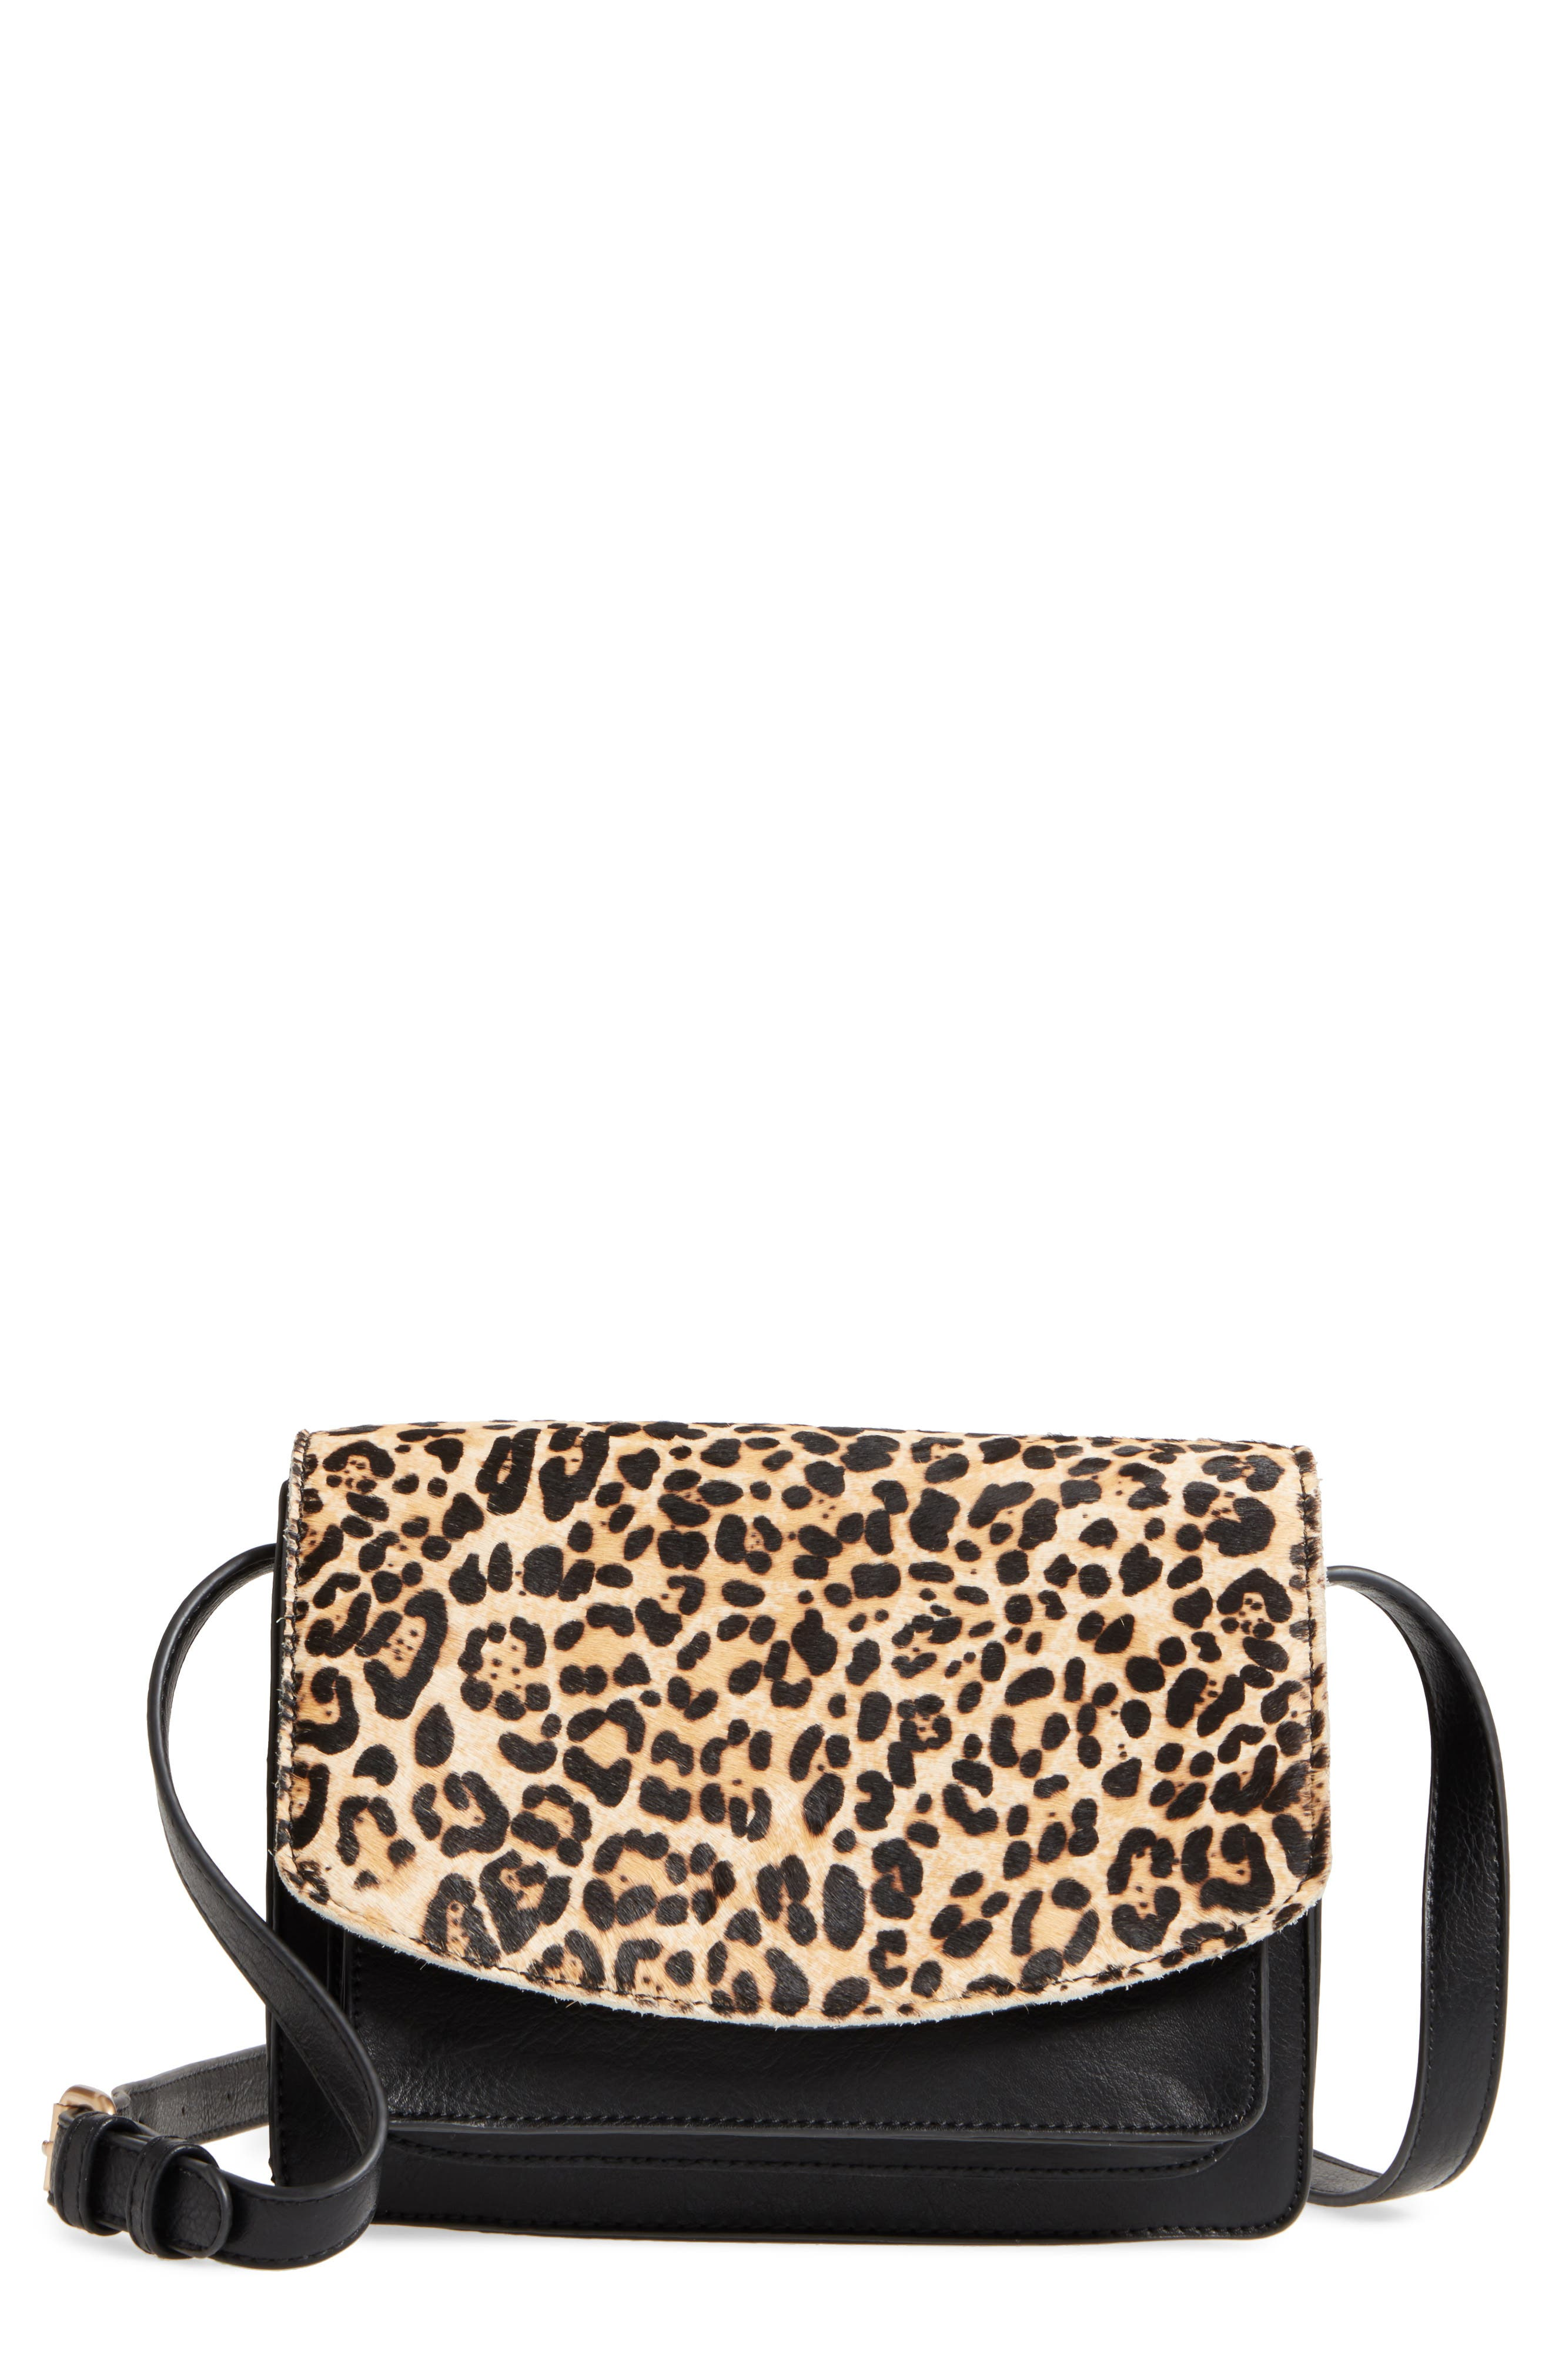 Alternate Image 1 Selected - Sole Society Michelle Genuine Calf Hair Flap Crossbody Bag